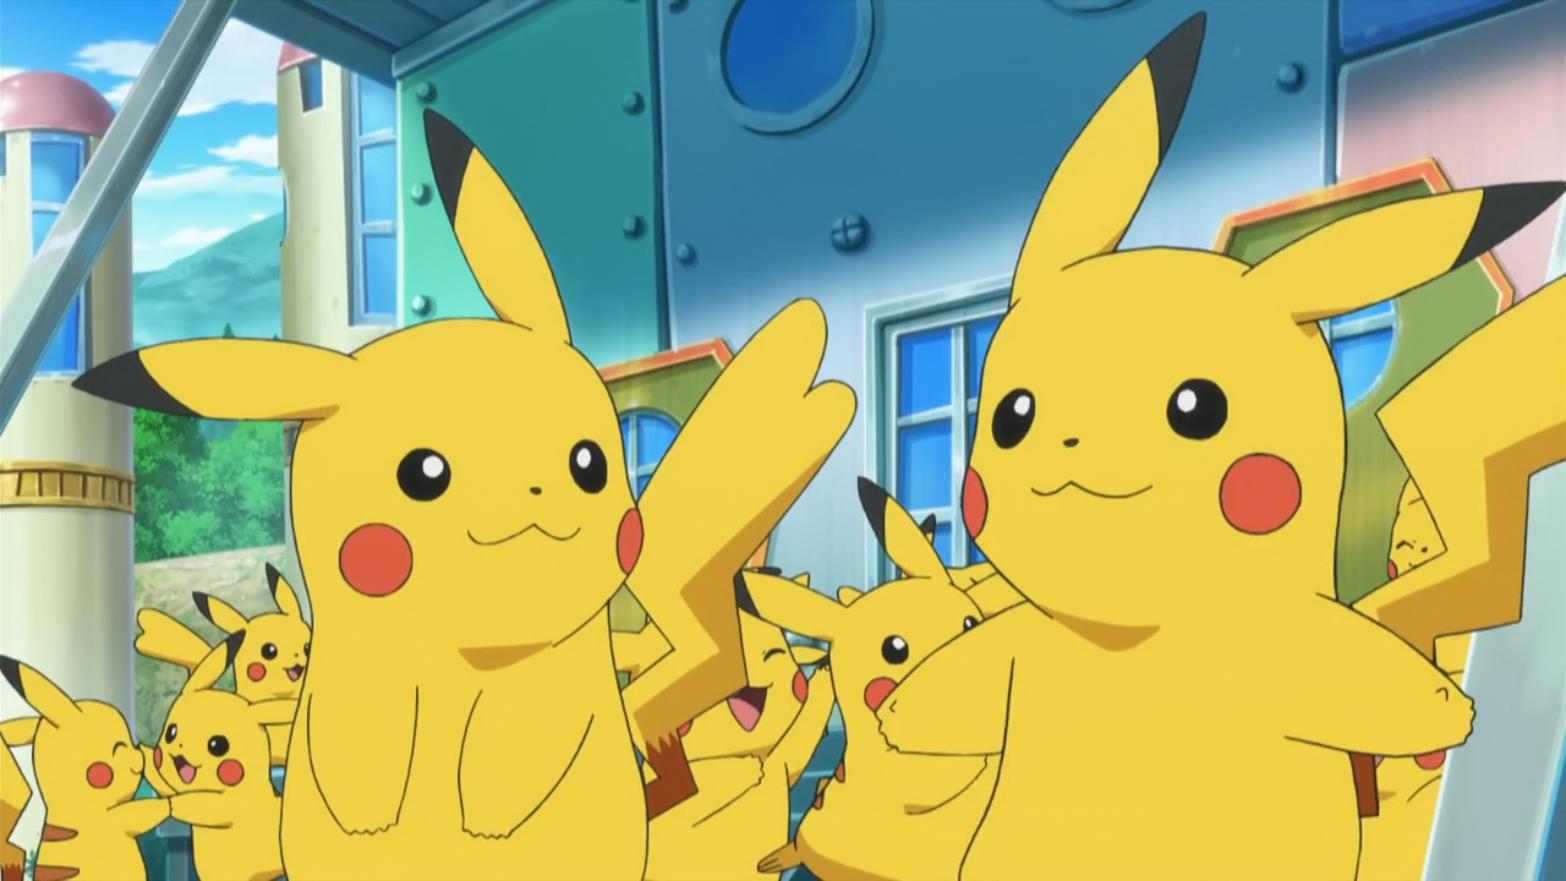 Frank's Pikachu